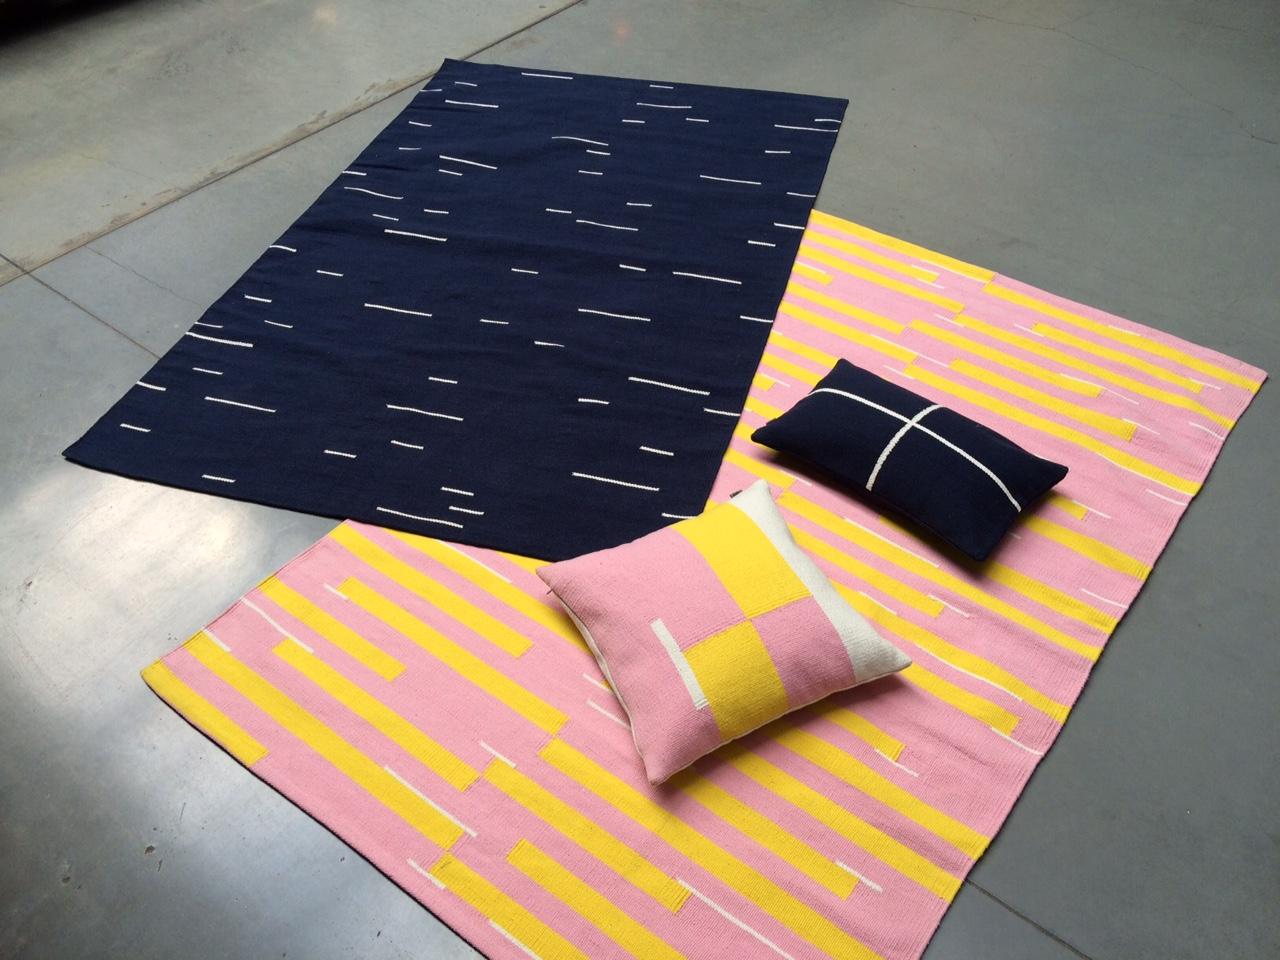 Jama-khan rugs in pink and blue - 120 x 180 cms Jama-khan square cushion - 45 x 45 cms Jama-khan rectangular cushion - 30 x 50 cms. All 100% handwoven cotton